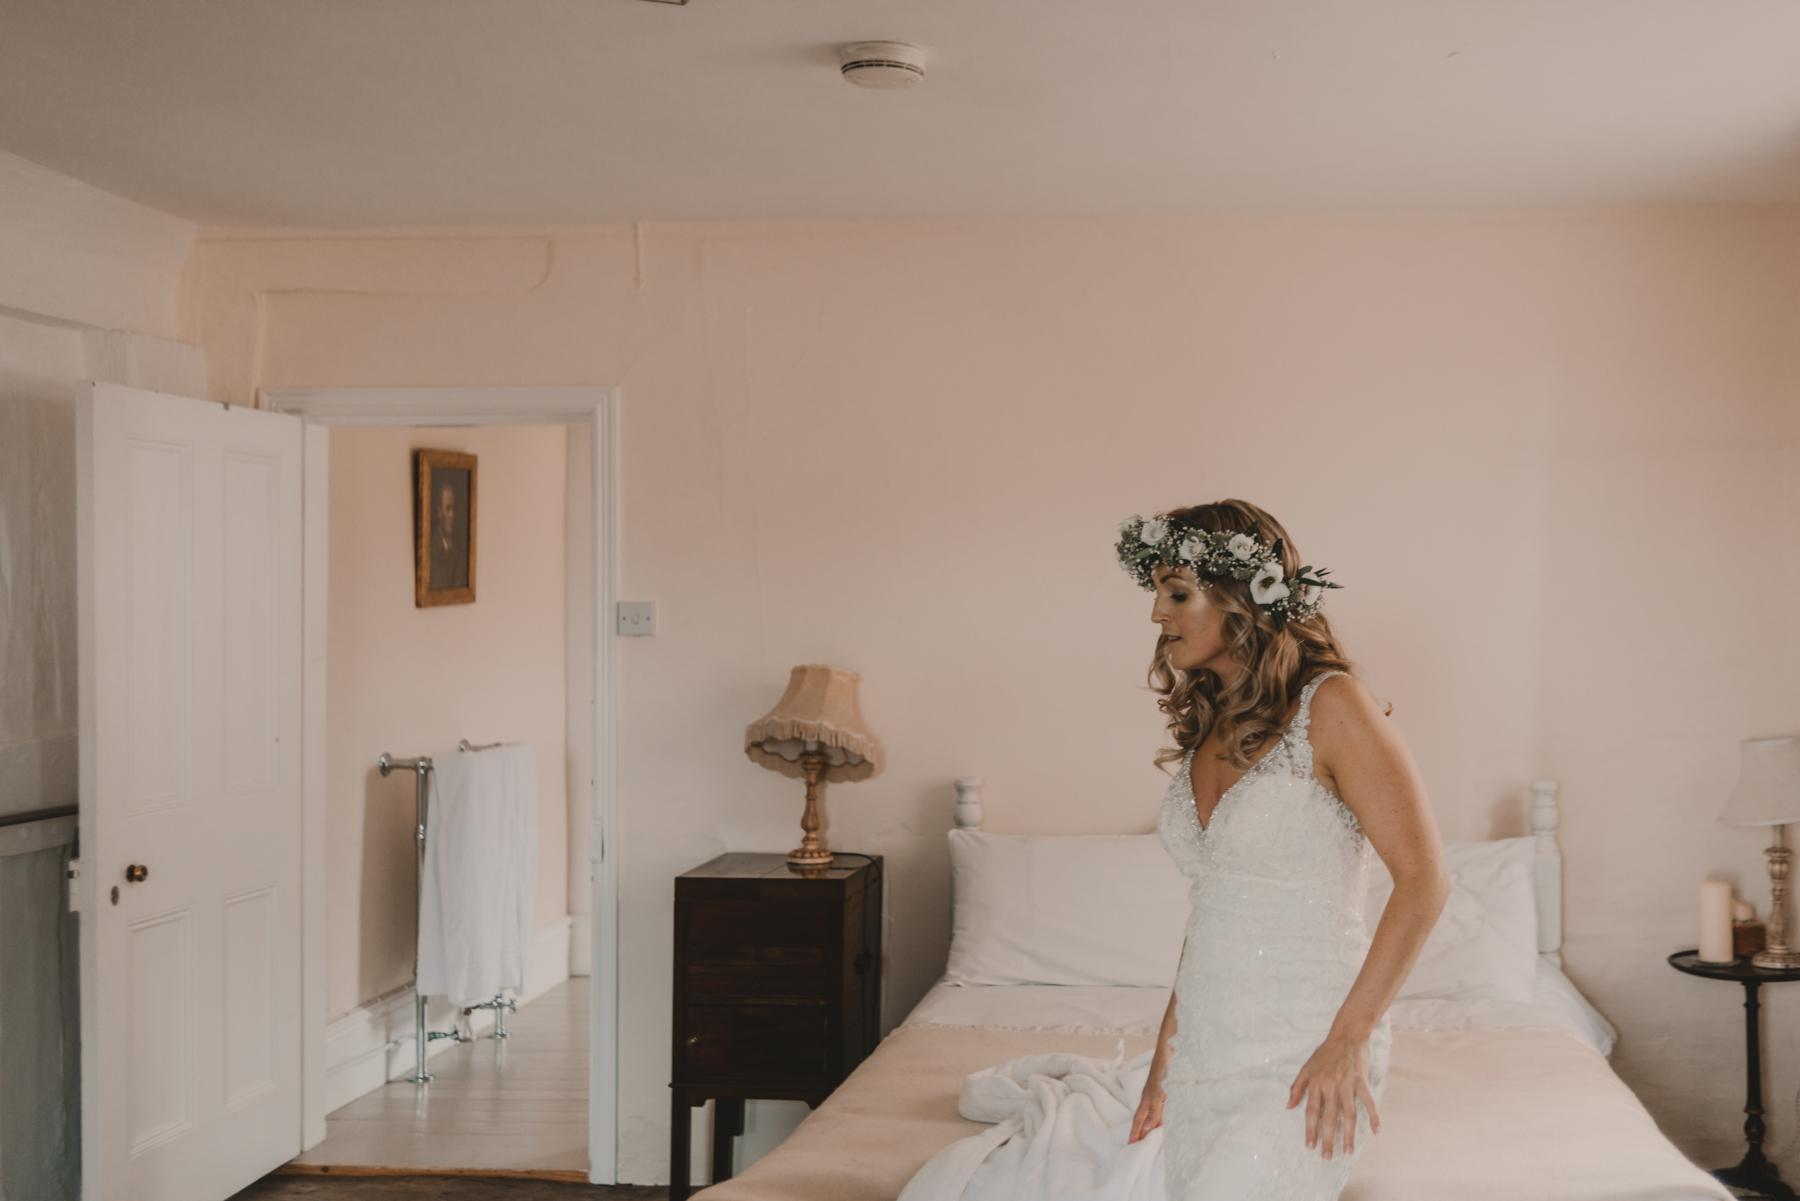 Herefordshire-barn-wedding-highlights-026.jpg